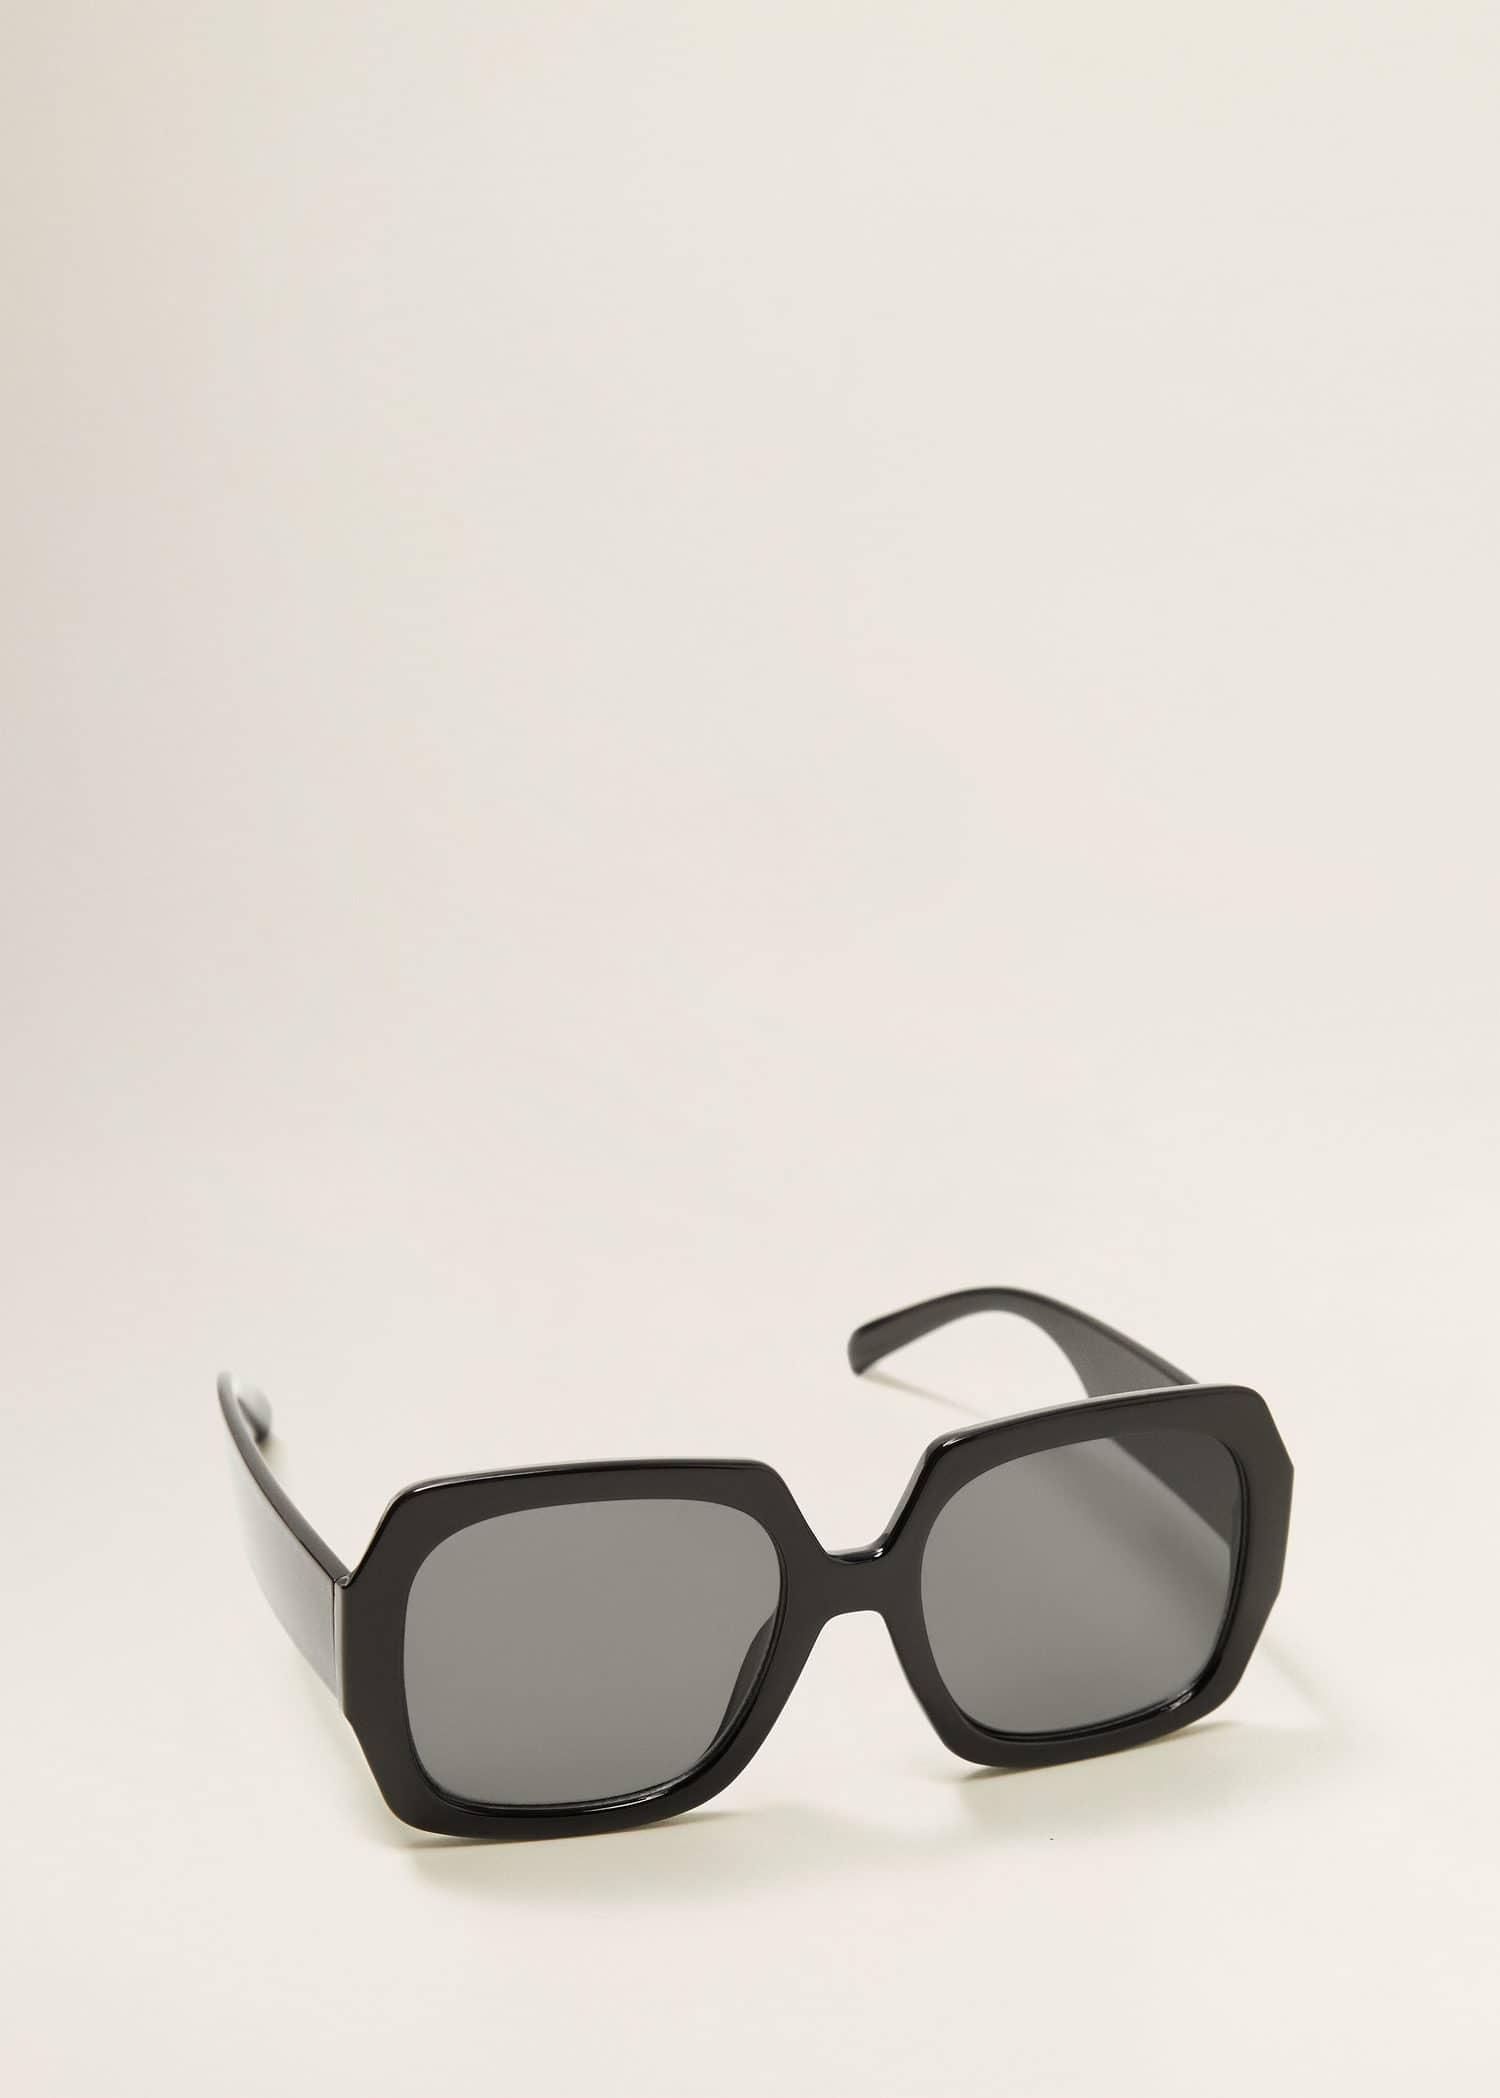 MujerMango Montura Gafas Uruguay De Sol Pasta 5LR4jc3AqS